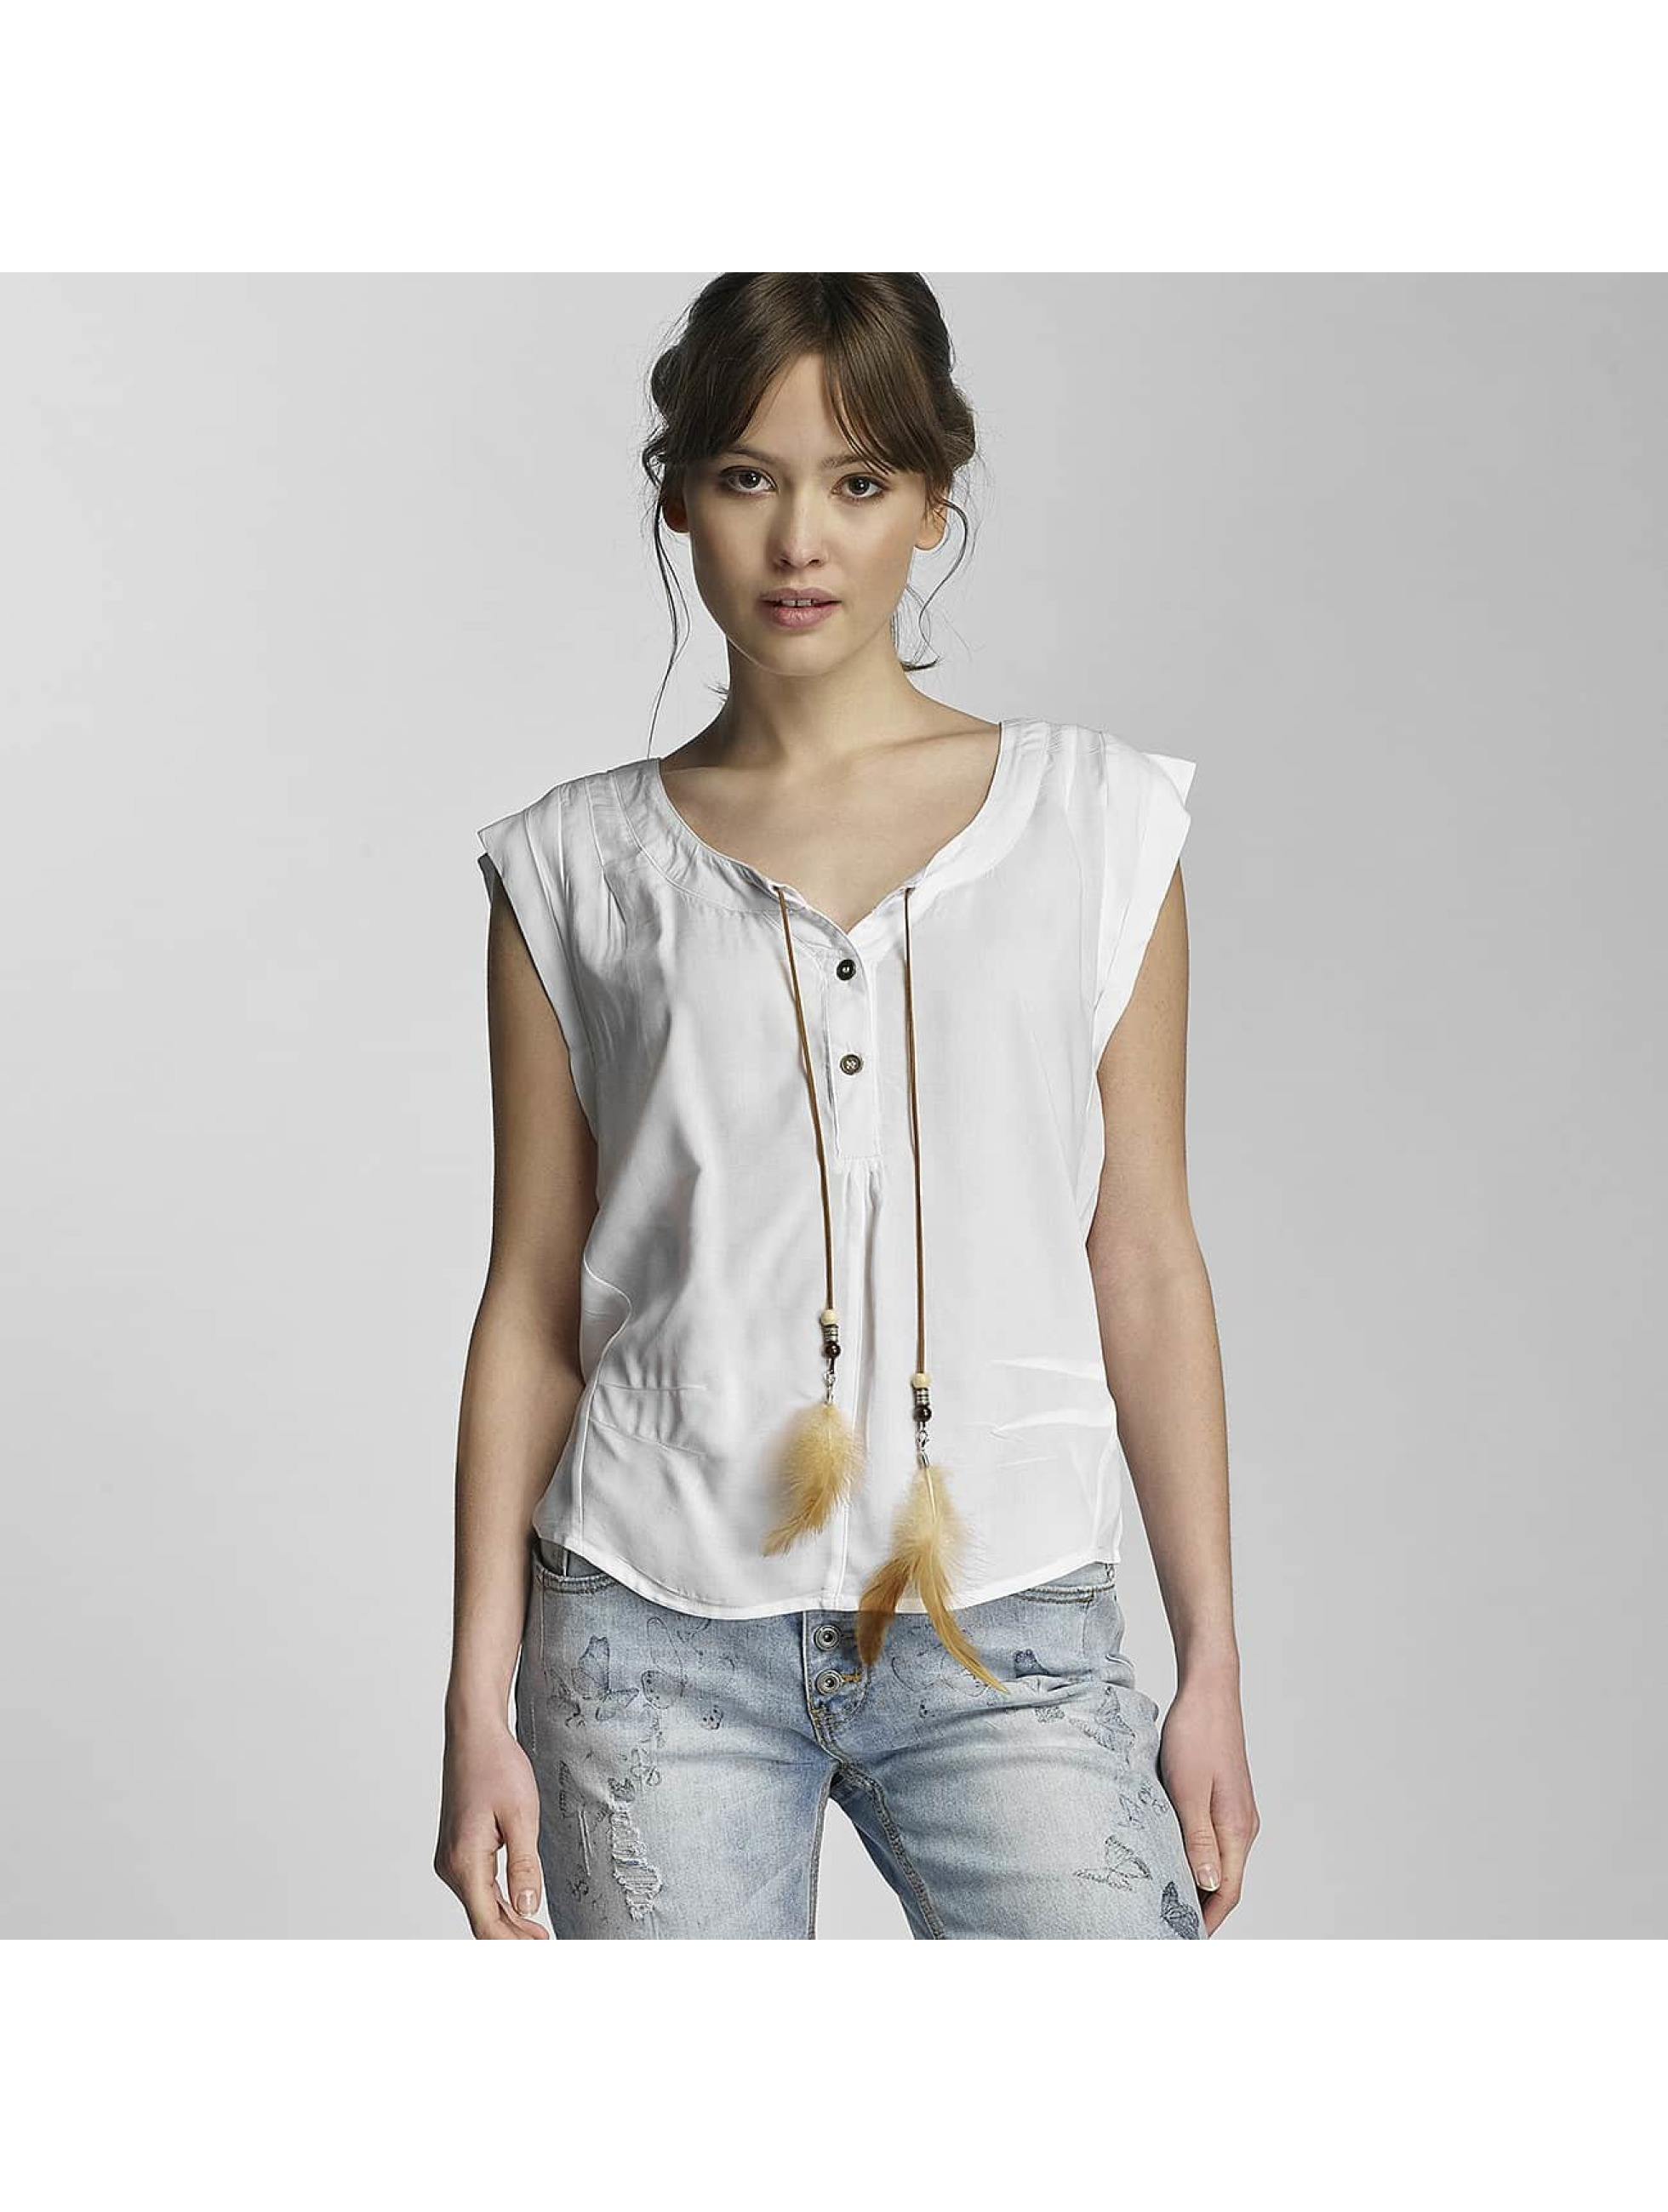 Stitch & Soul Frauen Bluse Lia in weiß